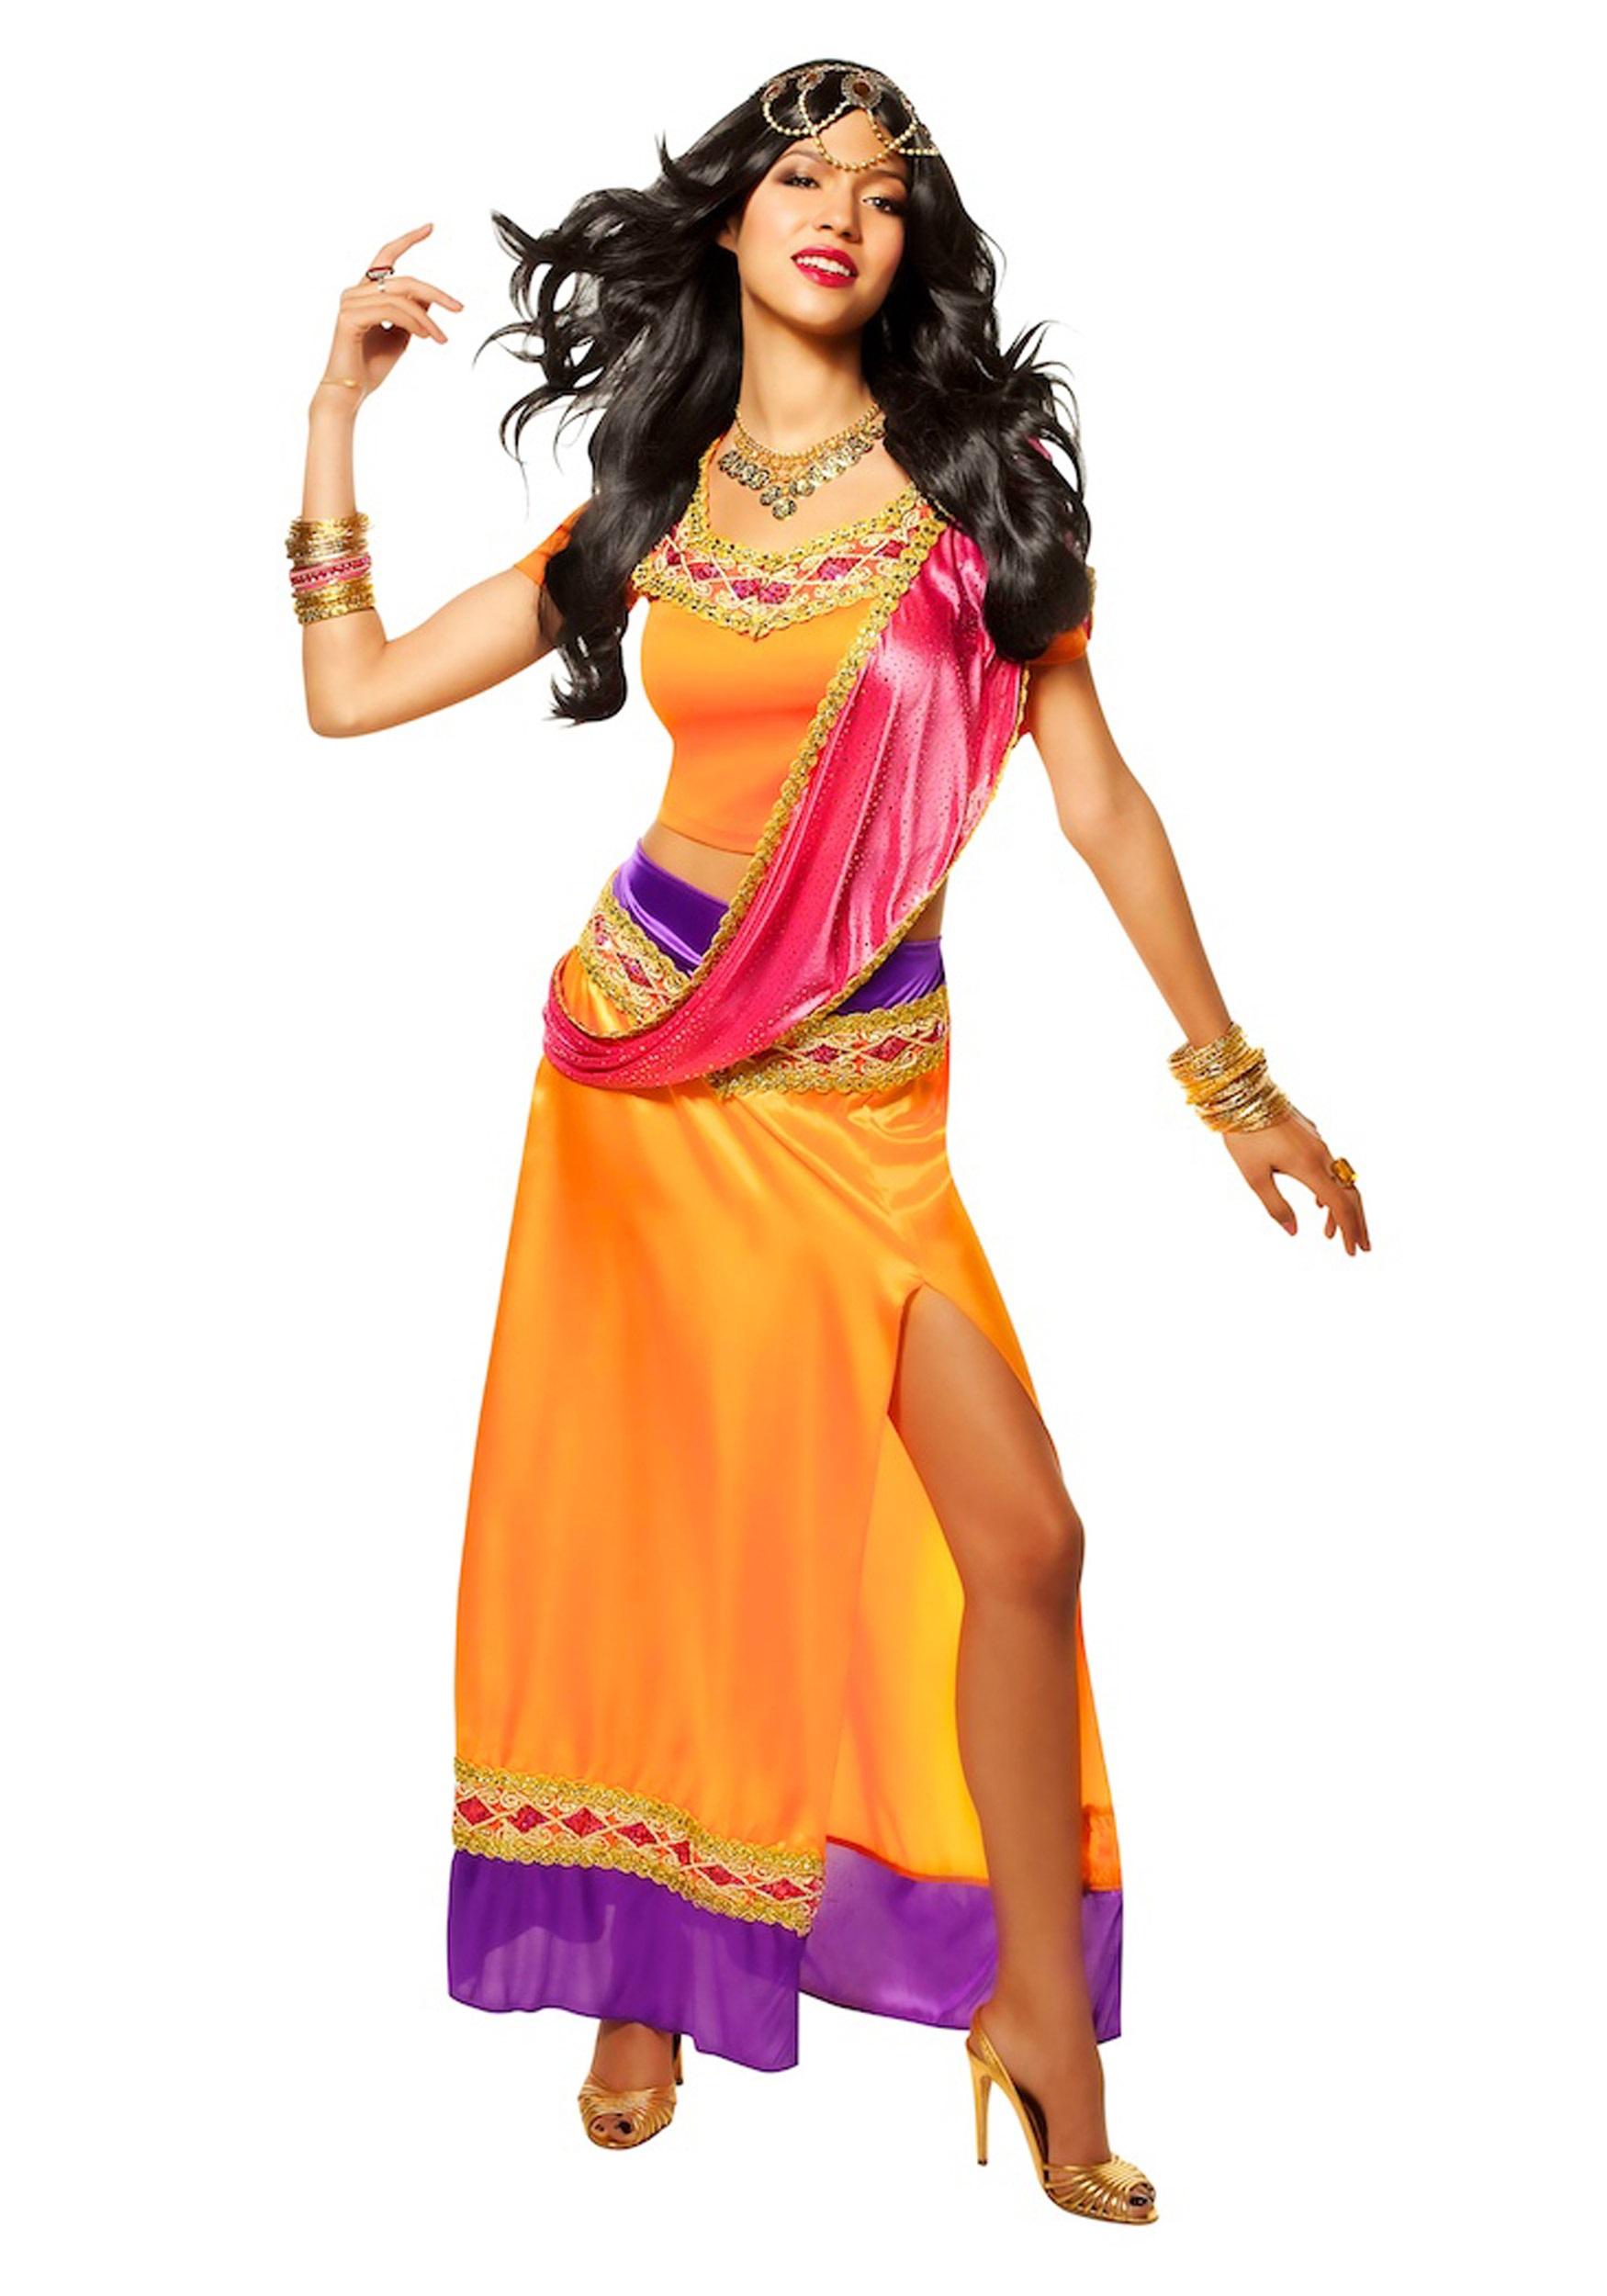 Exotic Goddess Adult Costume  sc 1 st  Halloween Costumes & Exotic Goddess Adult Costume - Halloween Costumes